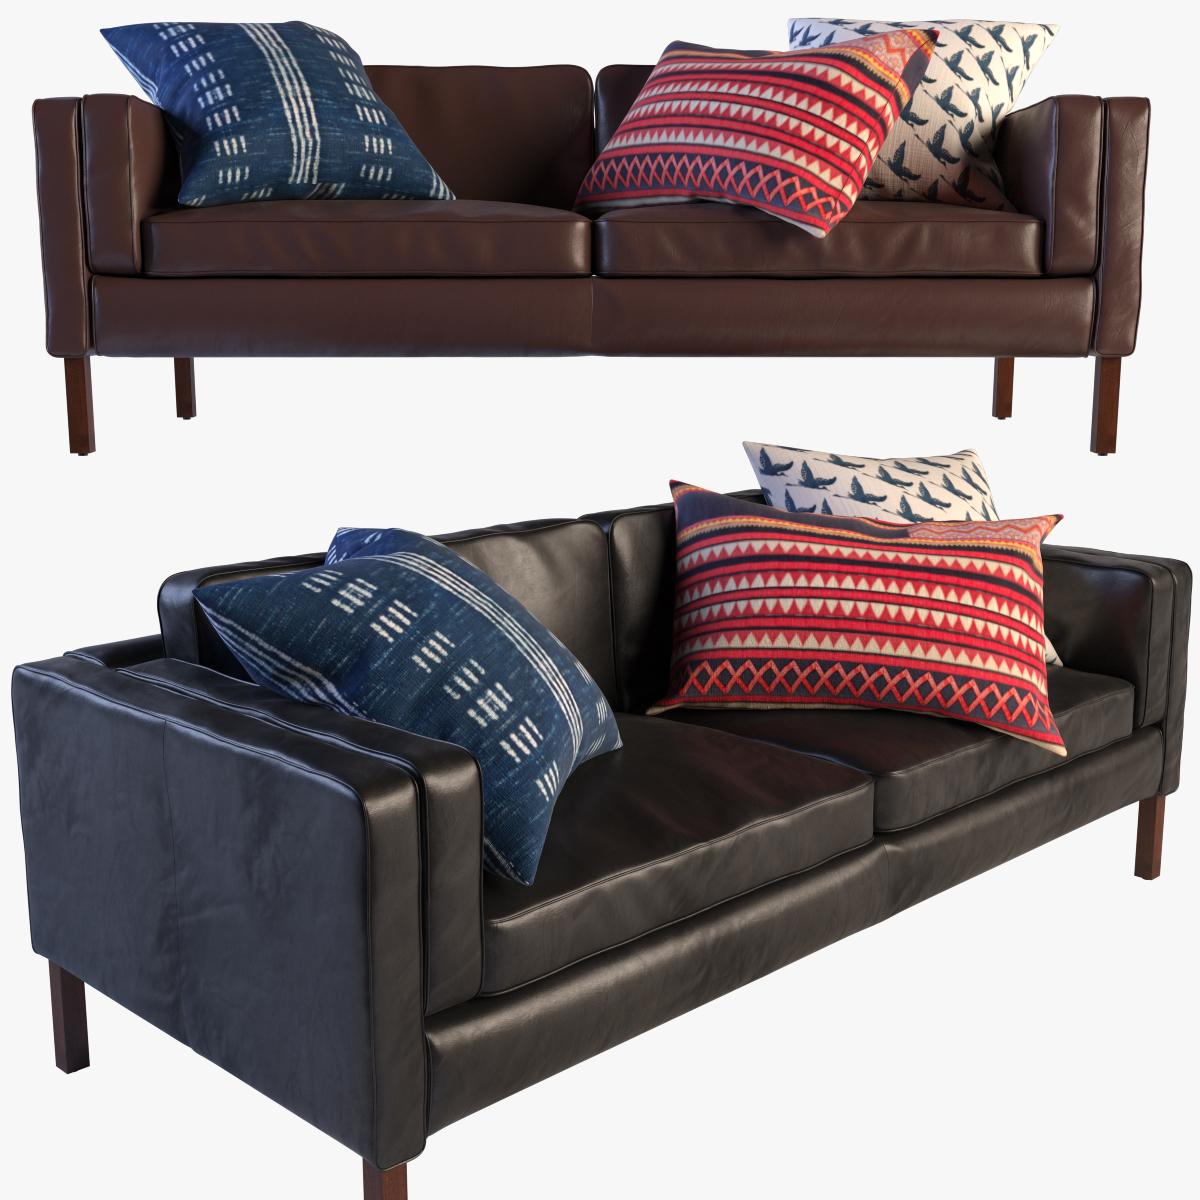 Austin Low Profile Leather Sofa Set